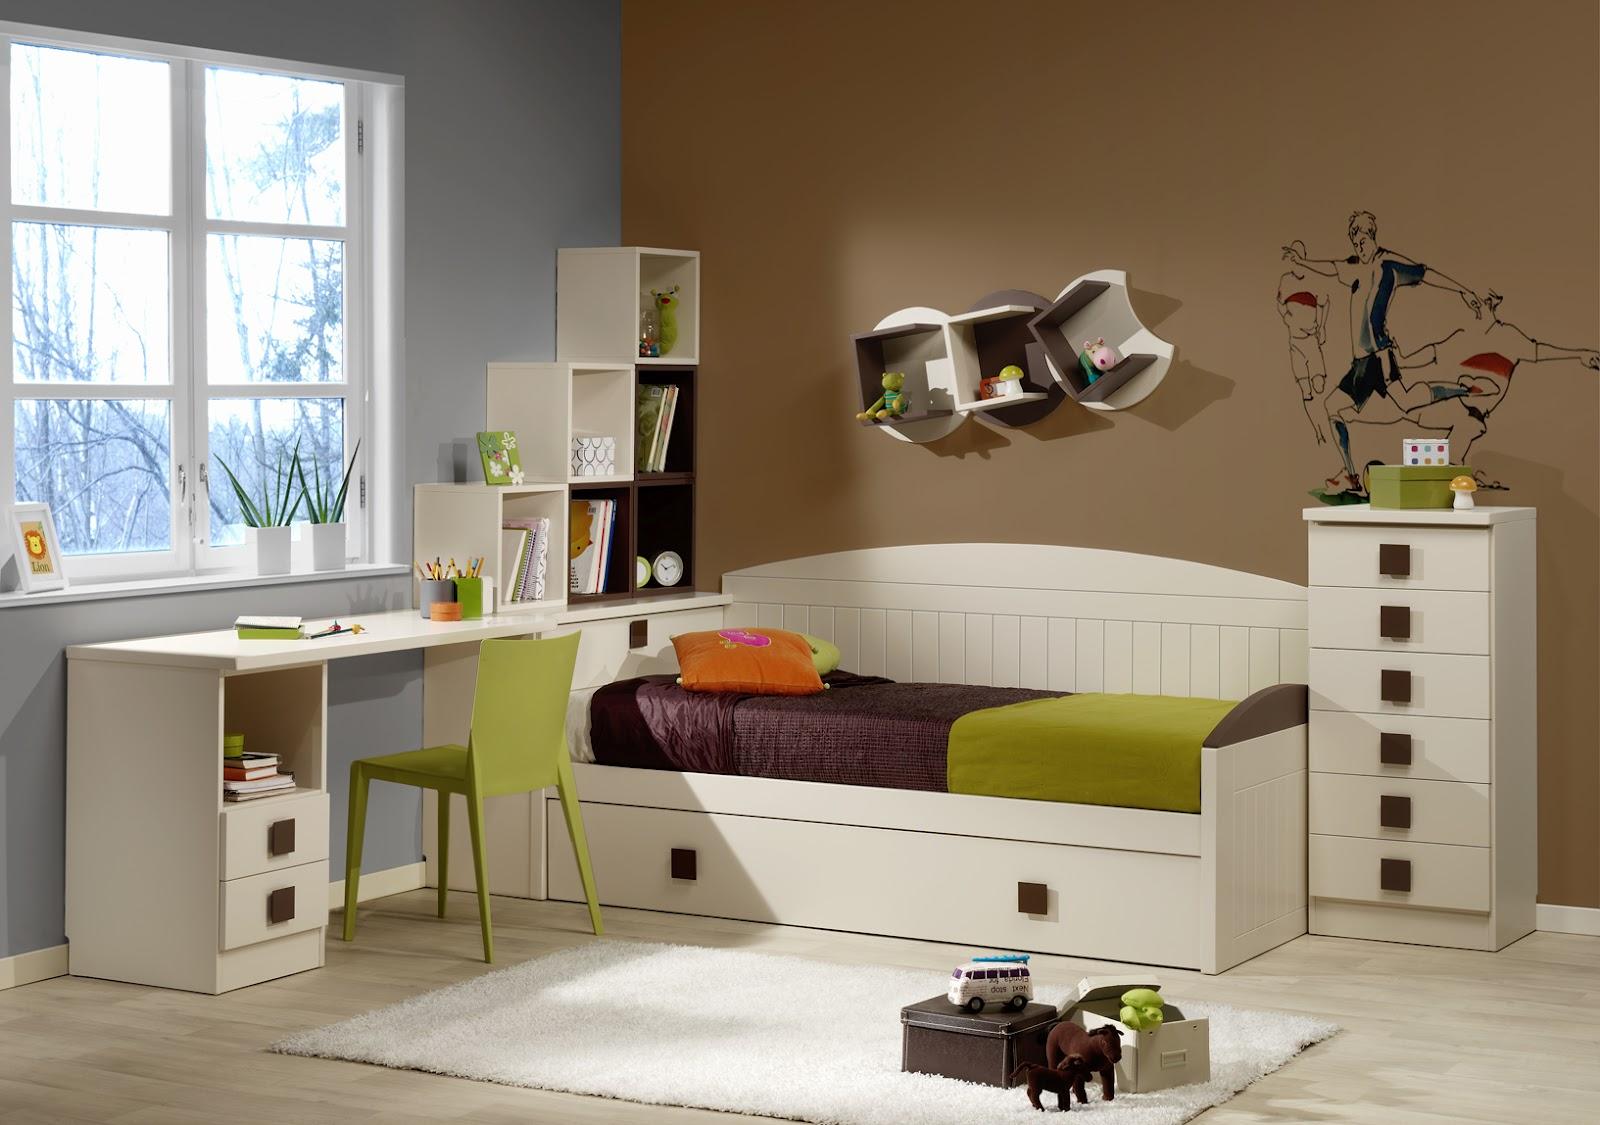 Dormitorios habitaciones juveniles e infantiles lacadas - Dormitorios modulares juveniles ...